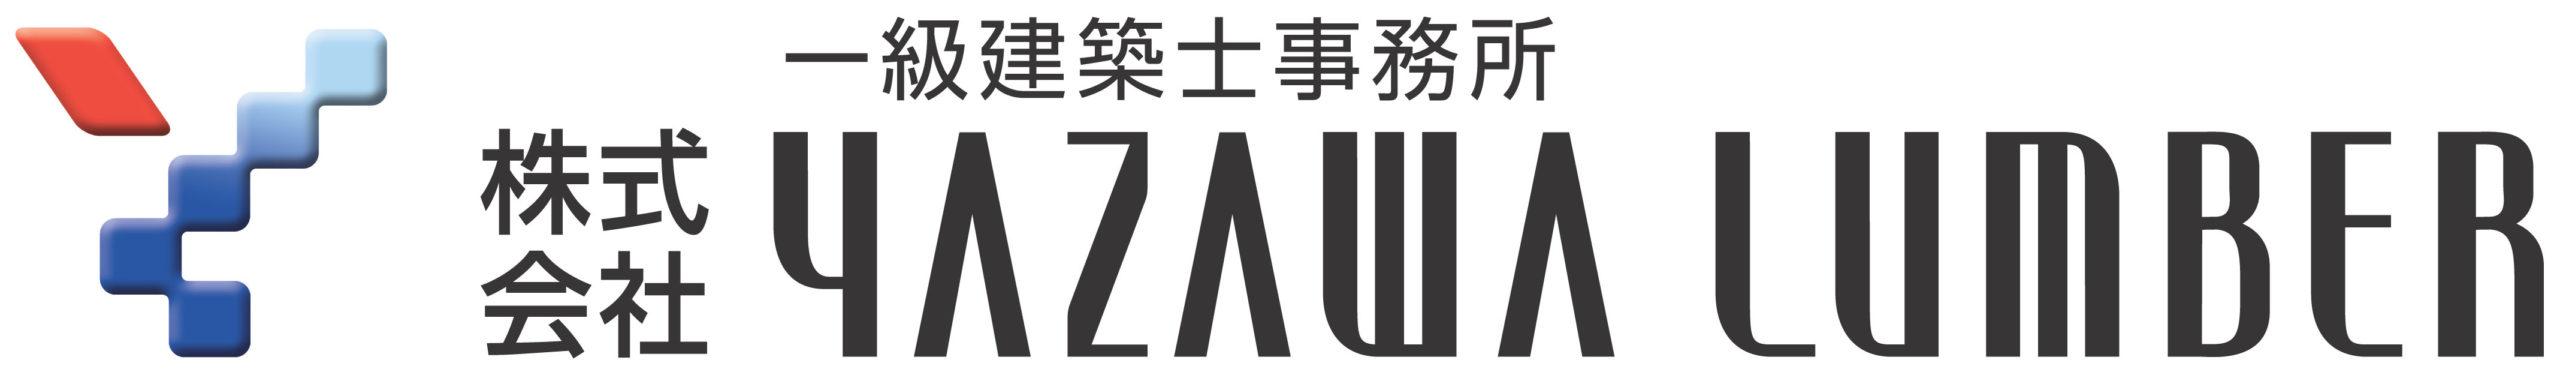 株式会社YAZAWA LUMBER